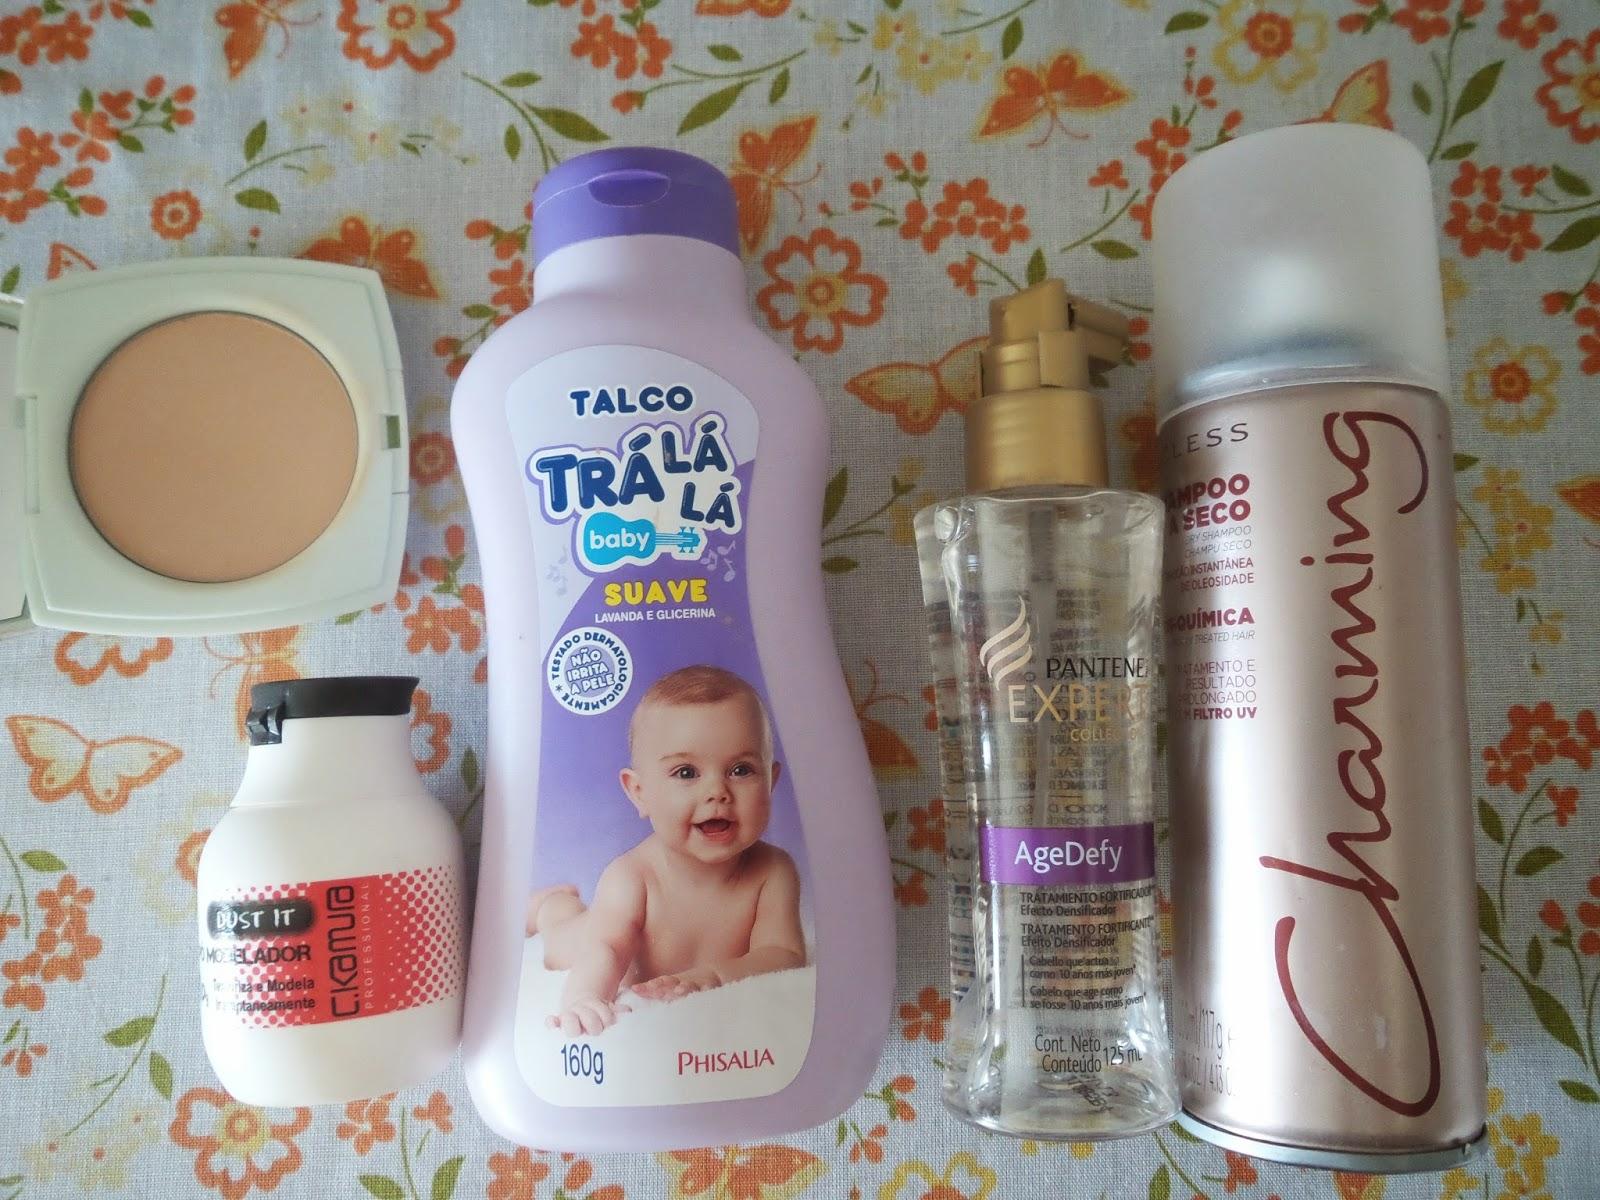 Combate a oleosidade e dá volume: Pó Compacto Renew FPS 15 Avon:   Pó Modelador  C.Kamura  Dust It,   Talco,  Shampoo seco Cless Charming